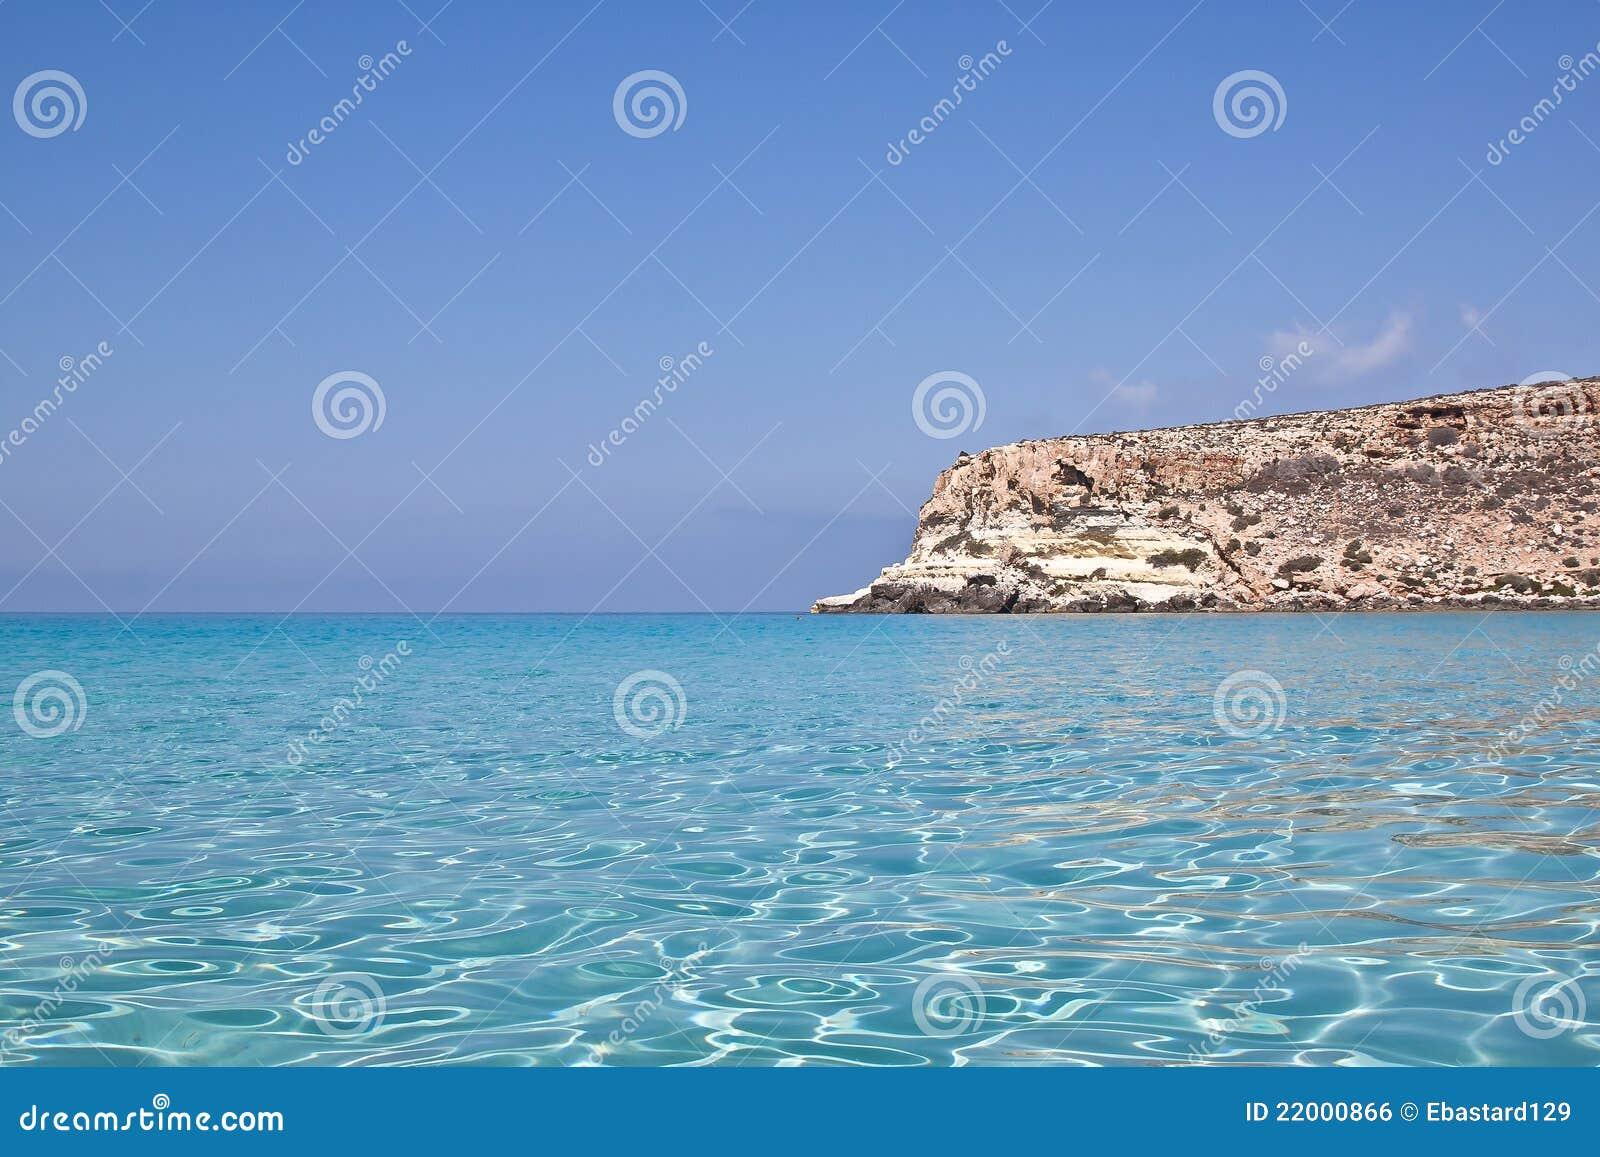 Blaues Meer von Lampedusa, Sizilien.